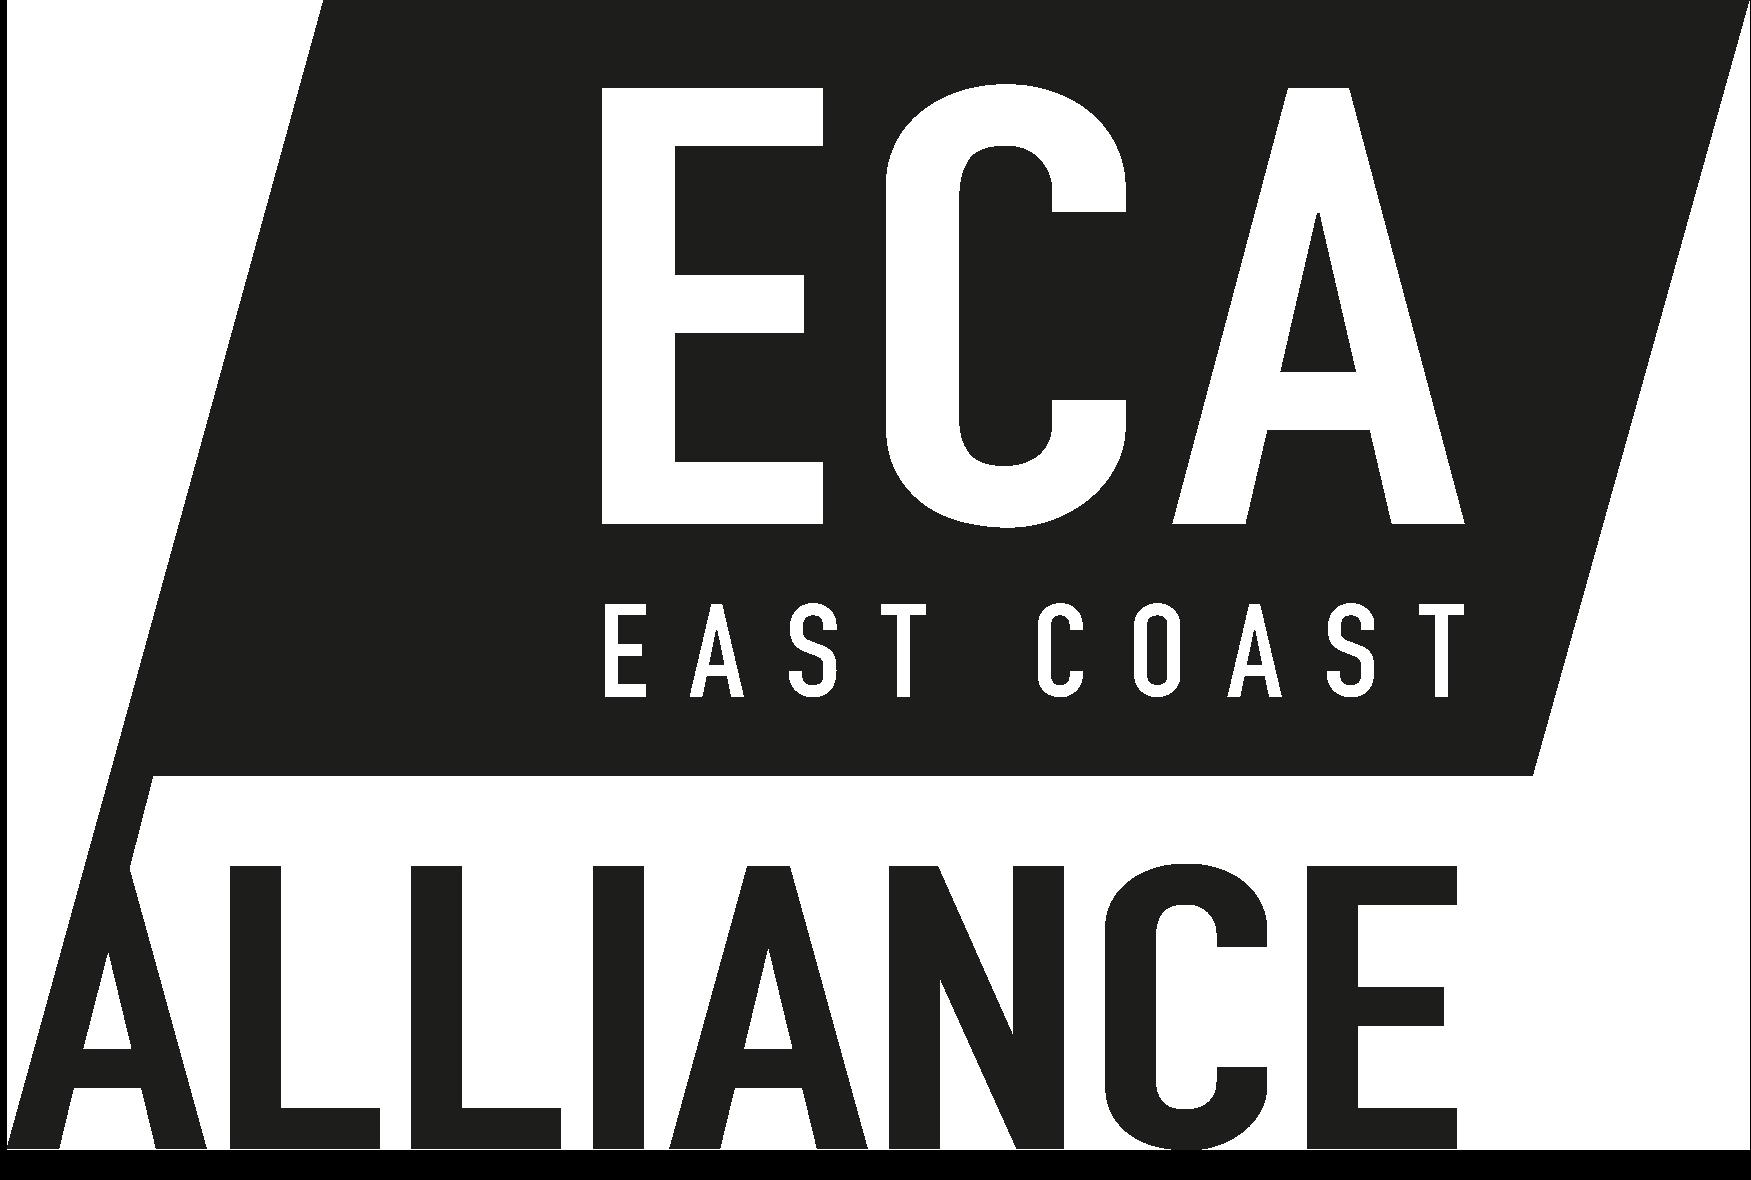 ECA_Brand_ID_final_black.png